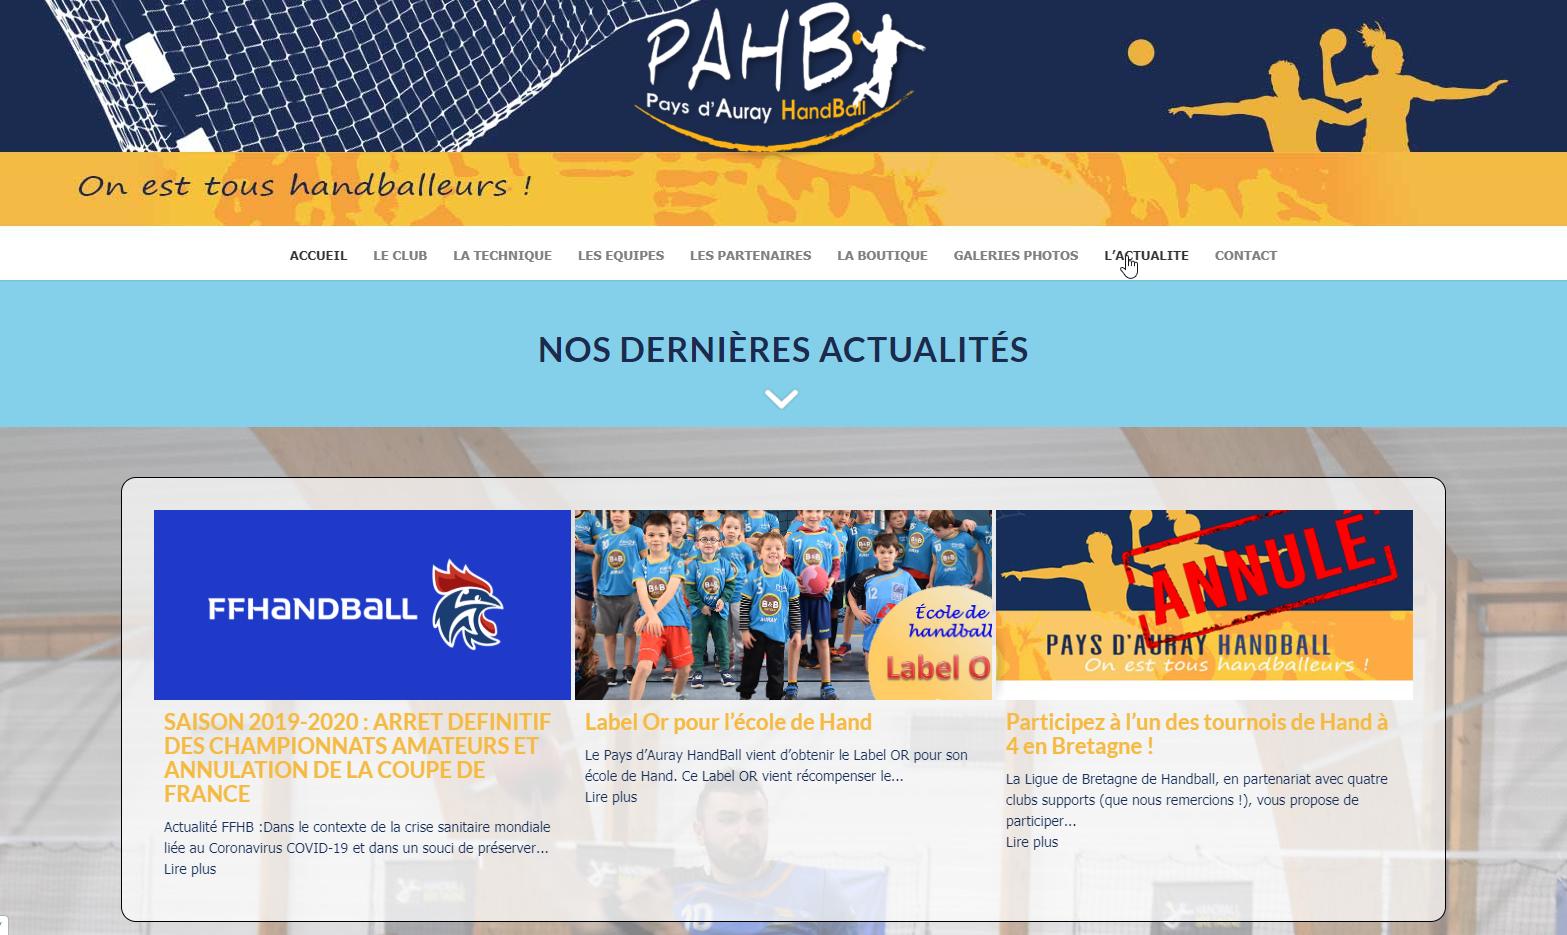 PAHB - Pays d'Auray Handball